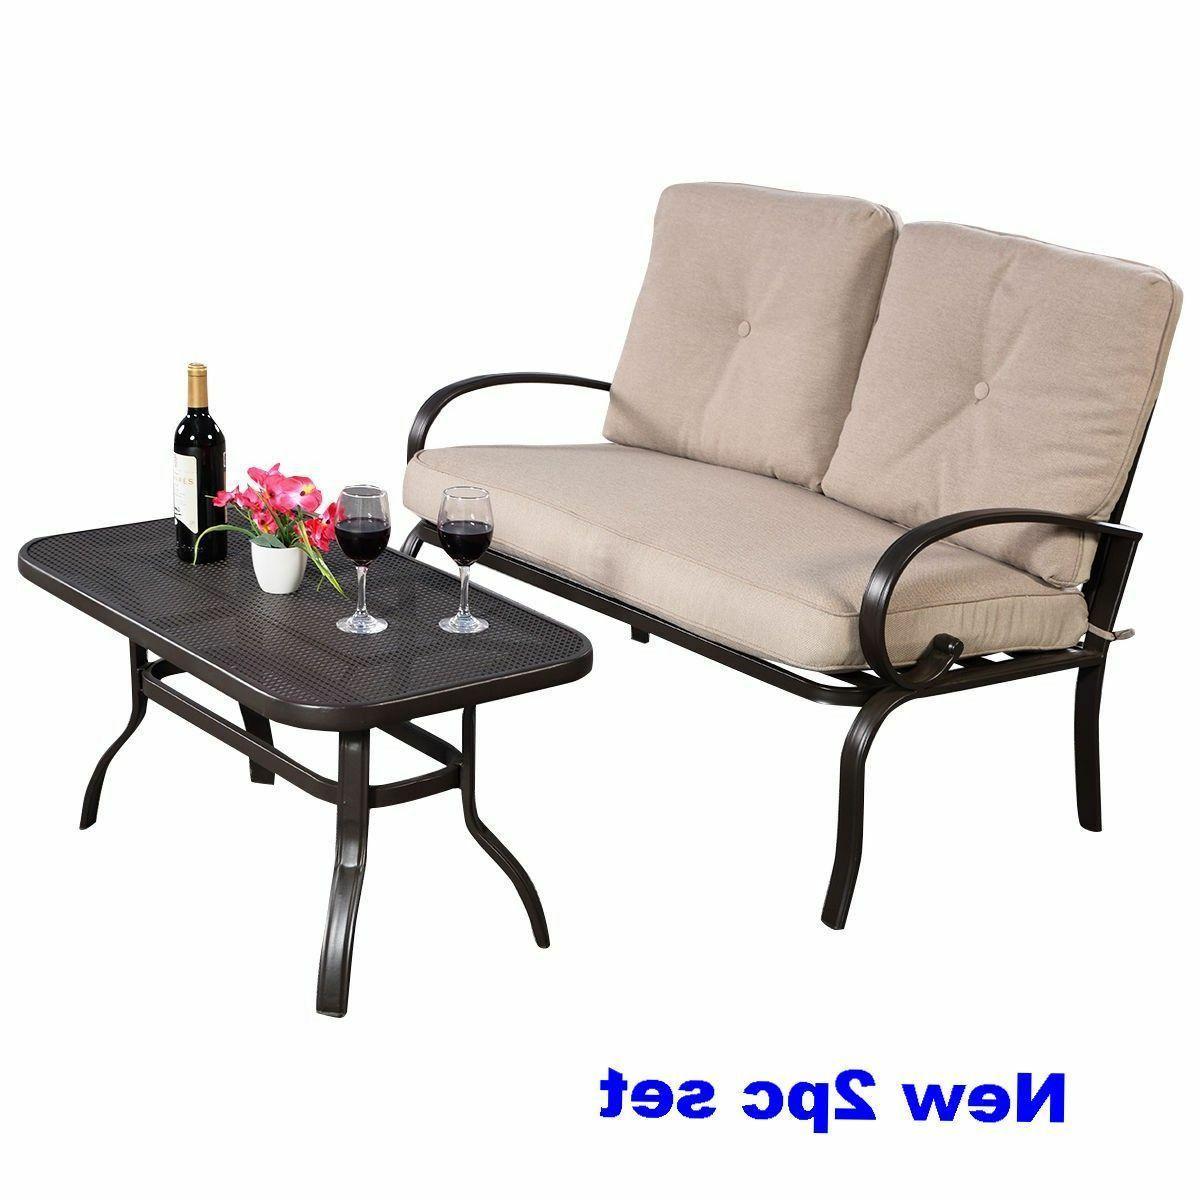 bistro steel seat coffee table loveseat cushion